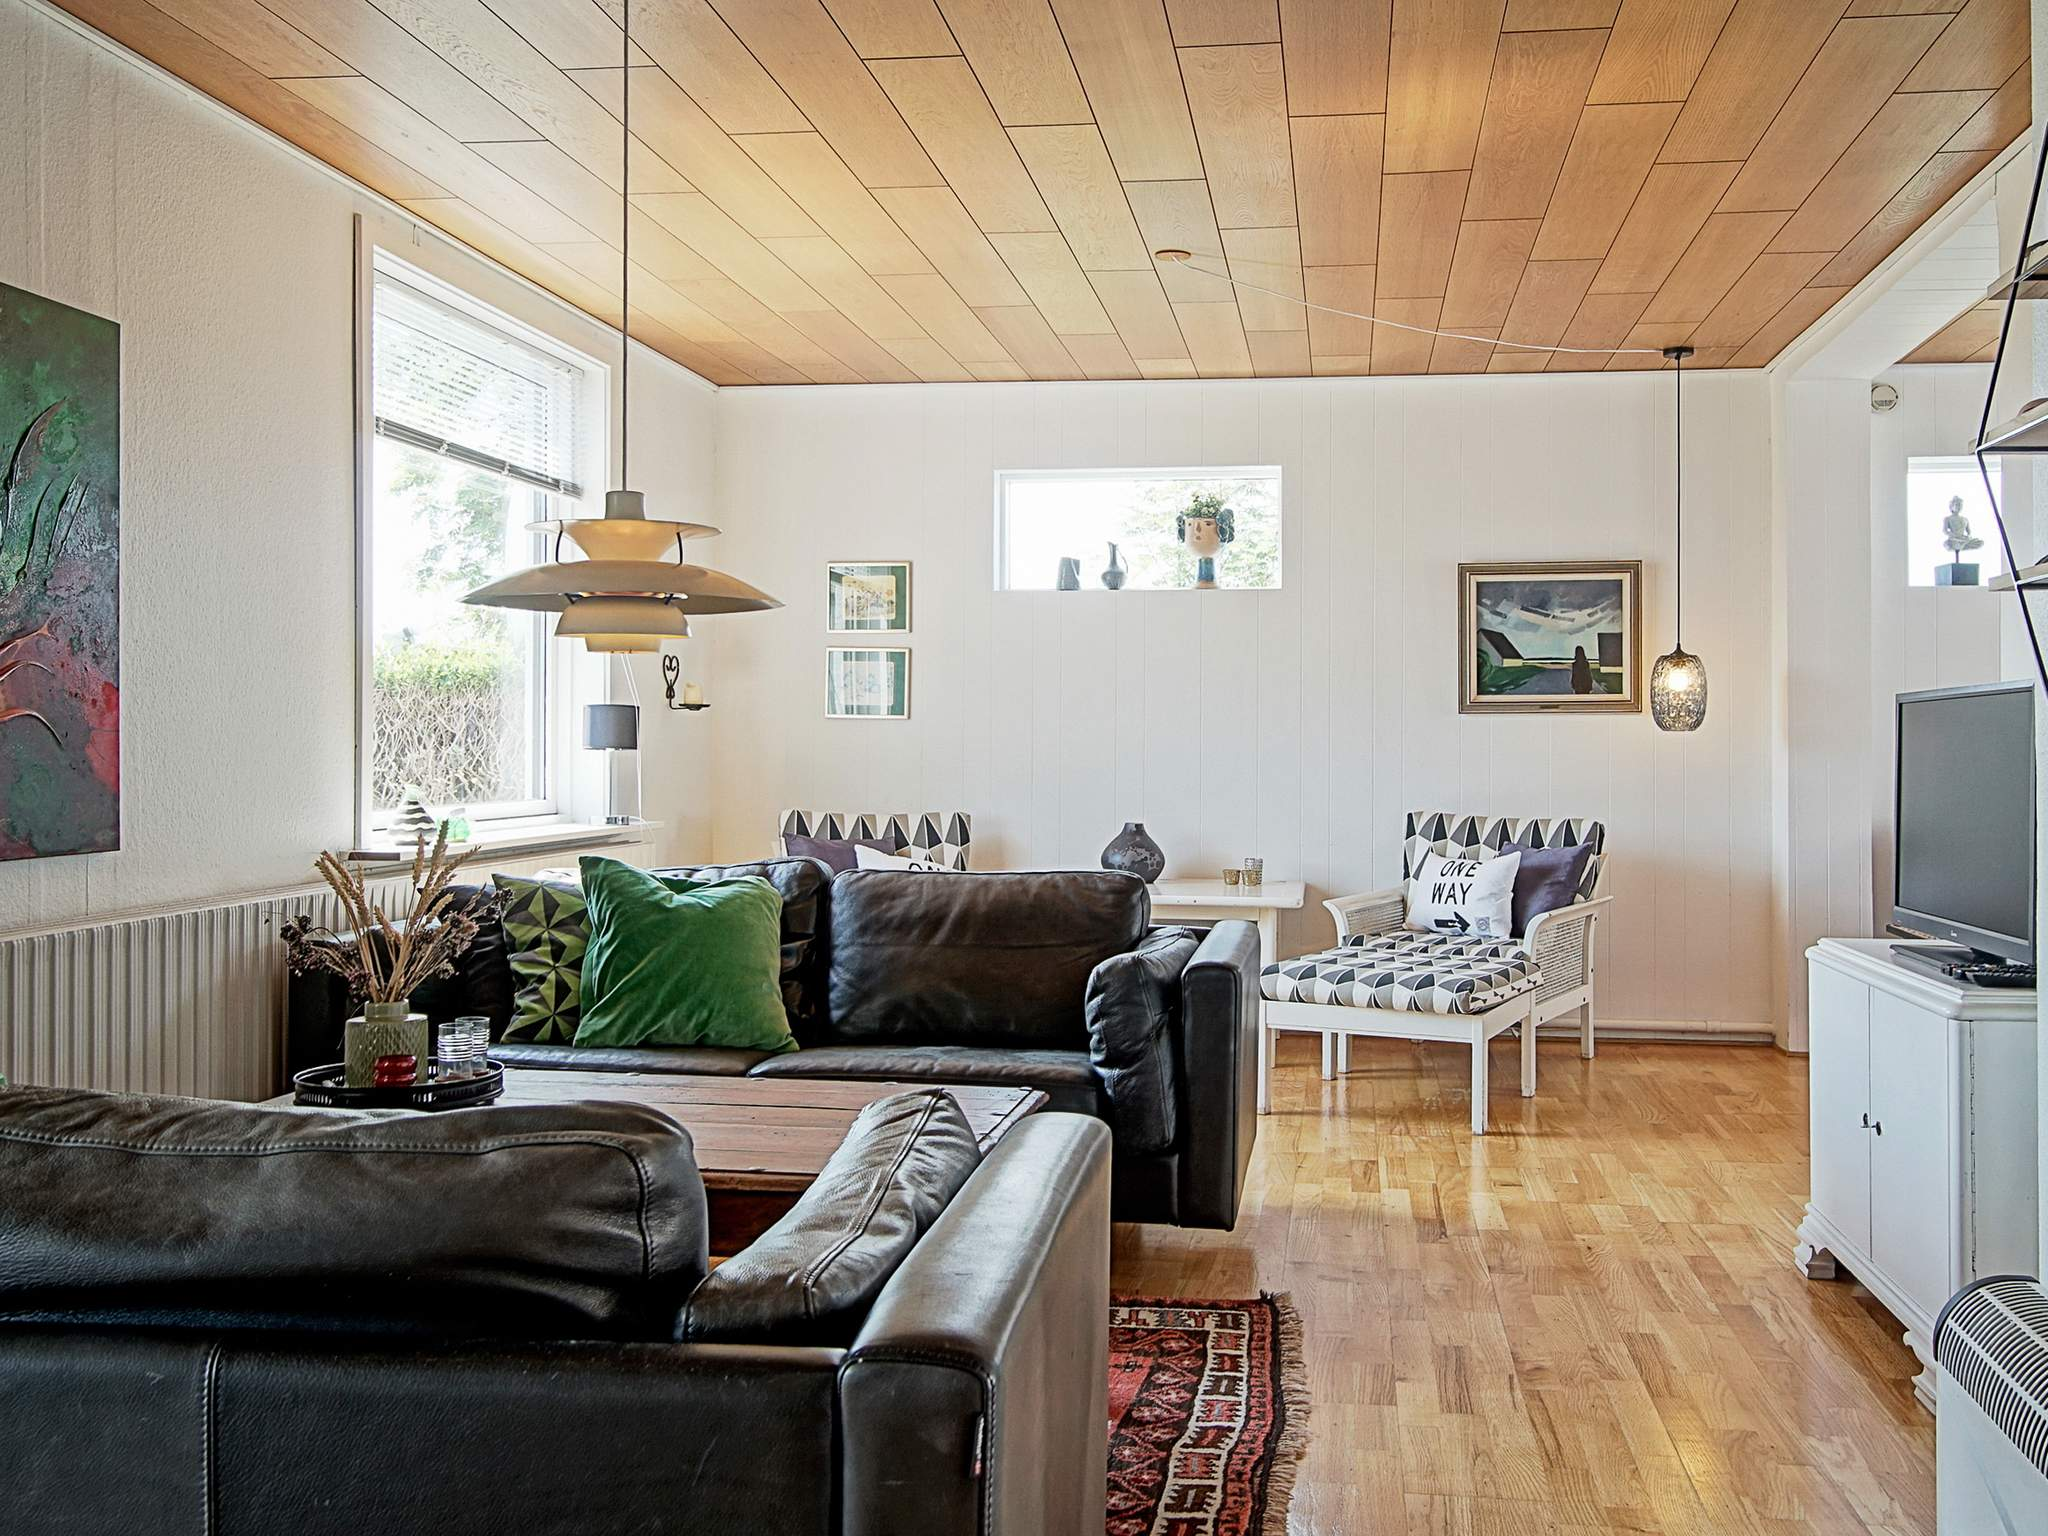 Ferienhaus Balka Strand (2429690), Balke, , Bornholm, Dänemark, Bild 5